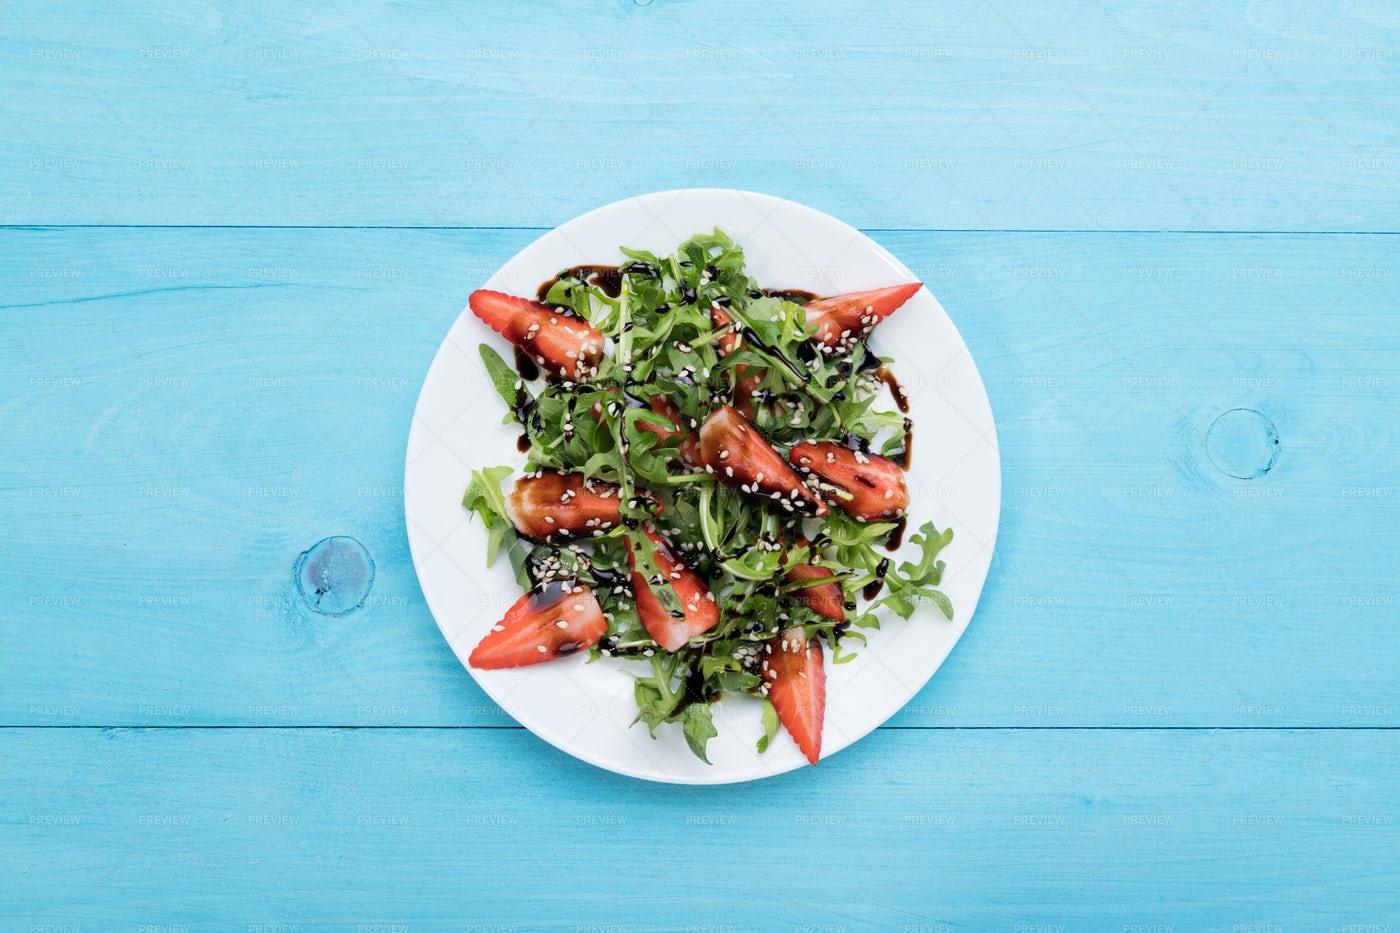 Arugula Strawberry Salad With Copy Space: Stock Photos